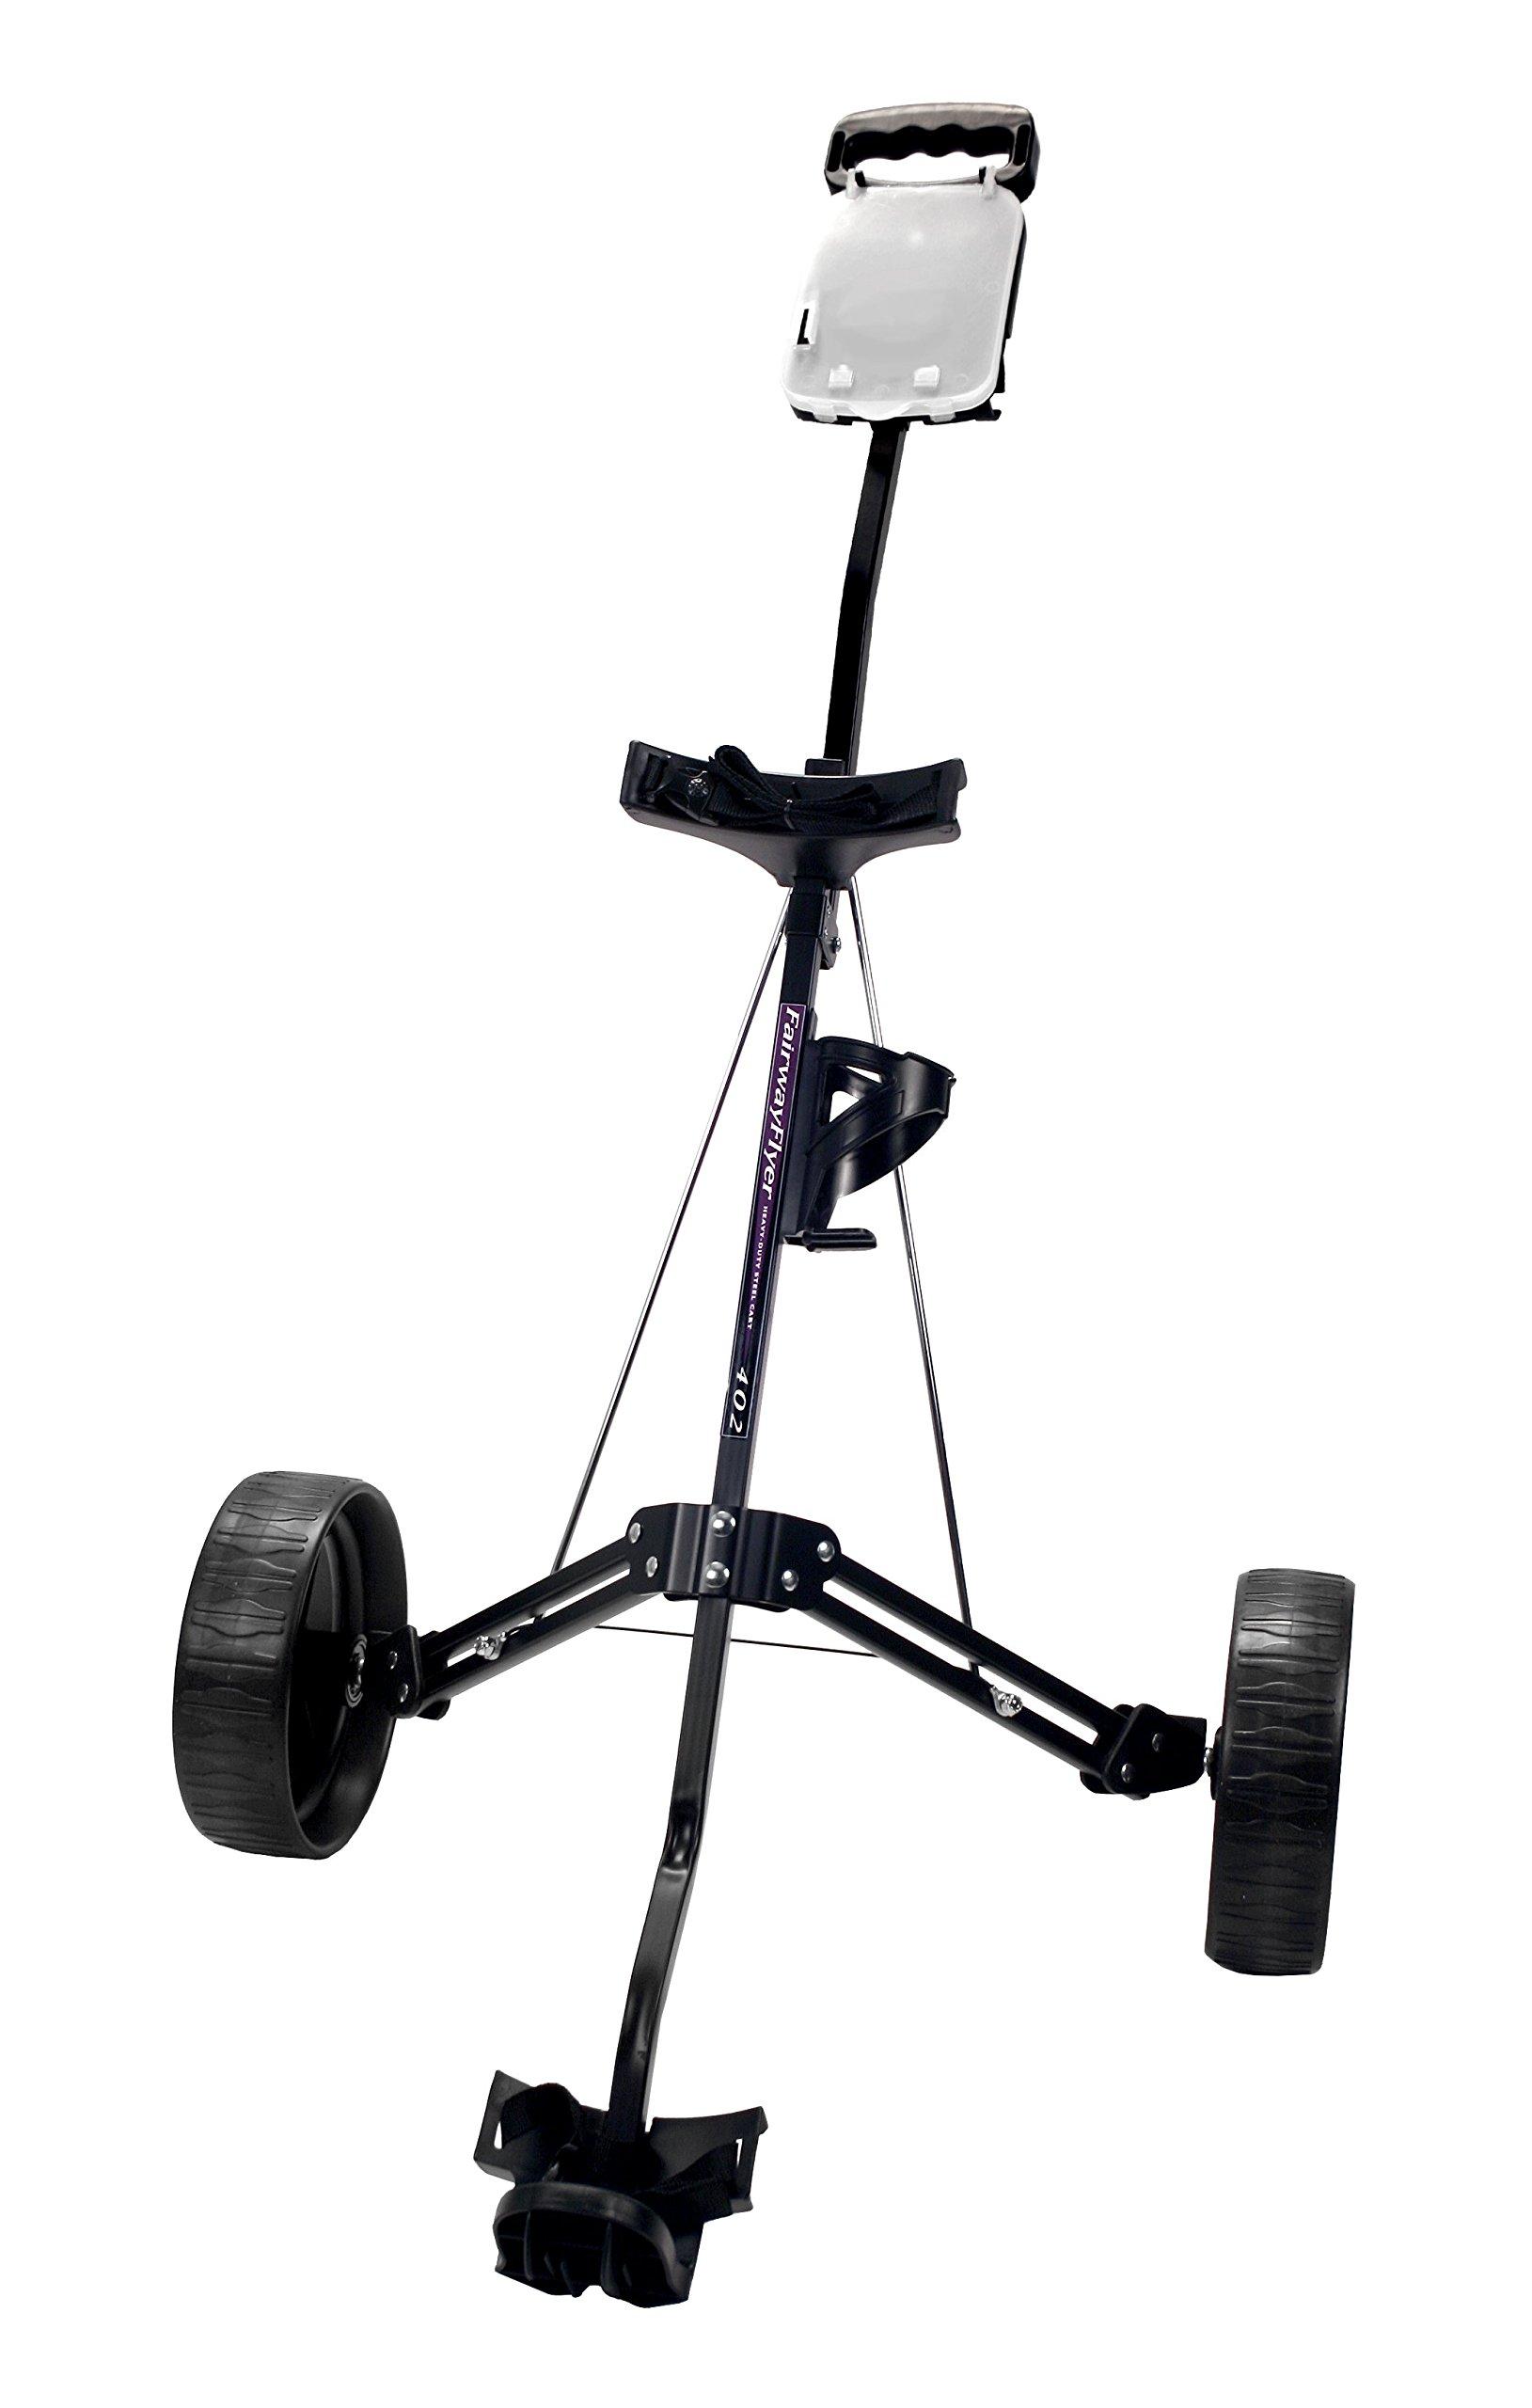 ProActive Sports Fairway Flyer 402 Golf Push Cart (Black)